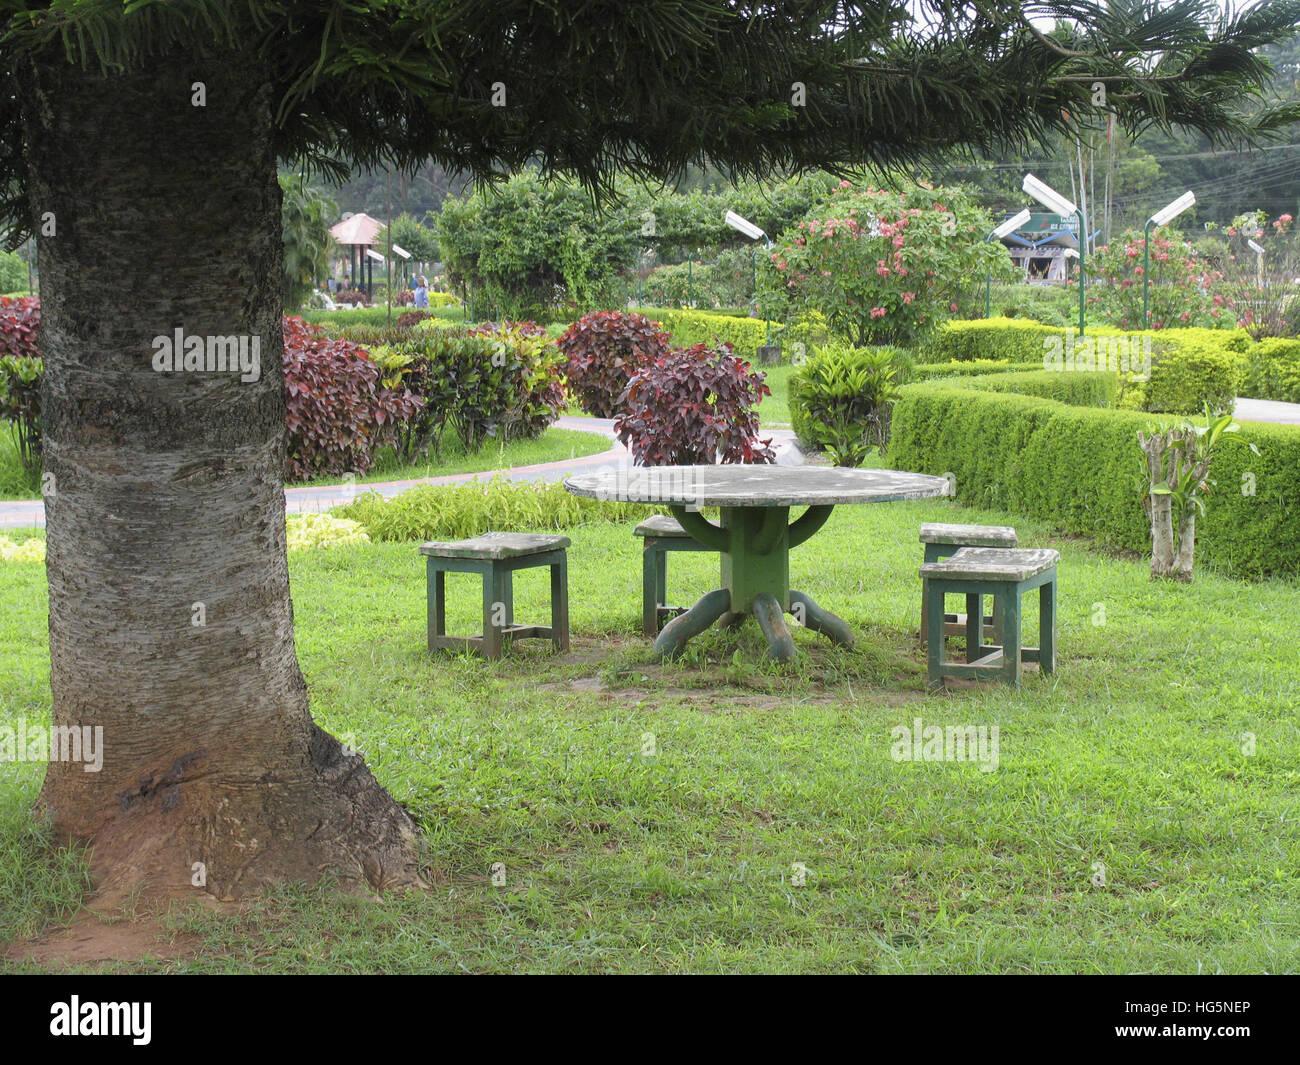 Astounding Malampuzha Garden Kerala India Stock Photo 130433710 Alamy Bralicious Painted Fabric Chair Ideas Braliciousco